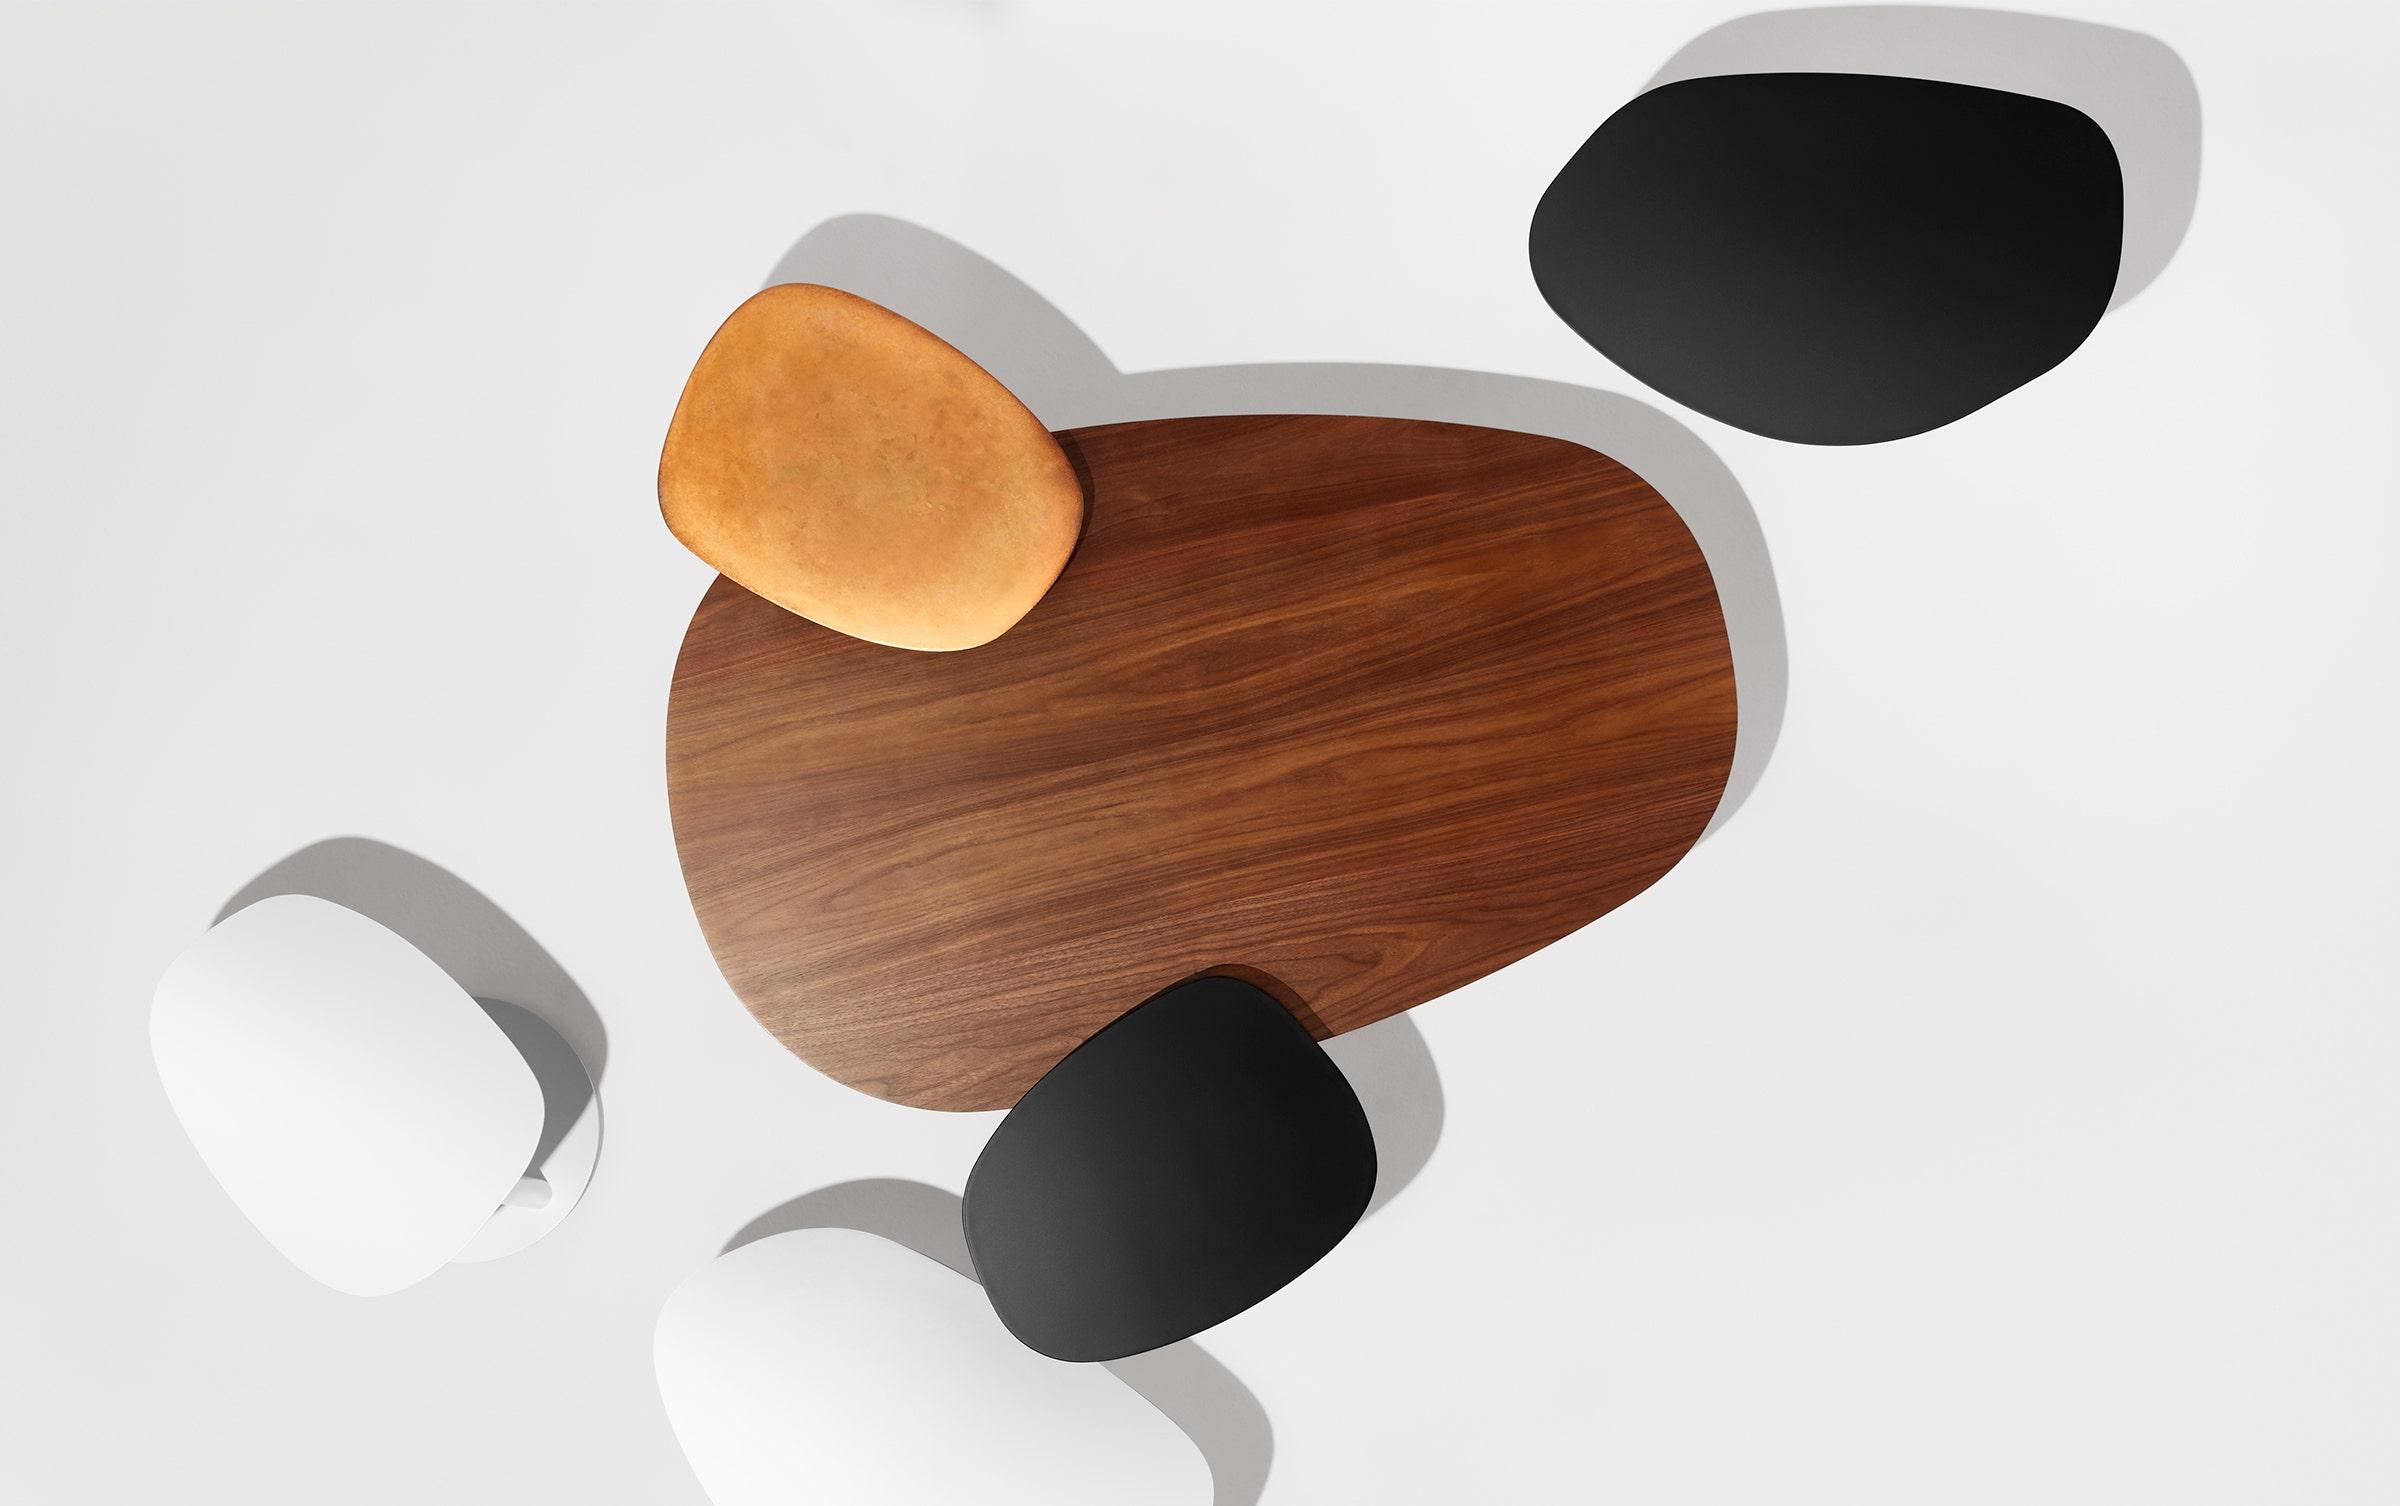 Swole Large Table